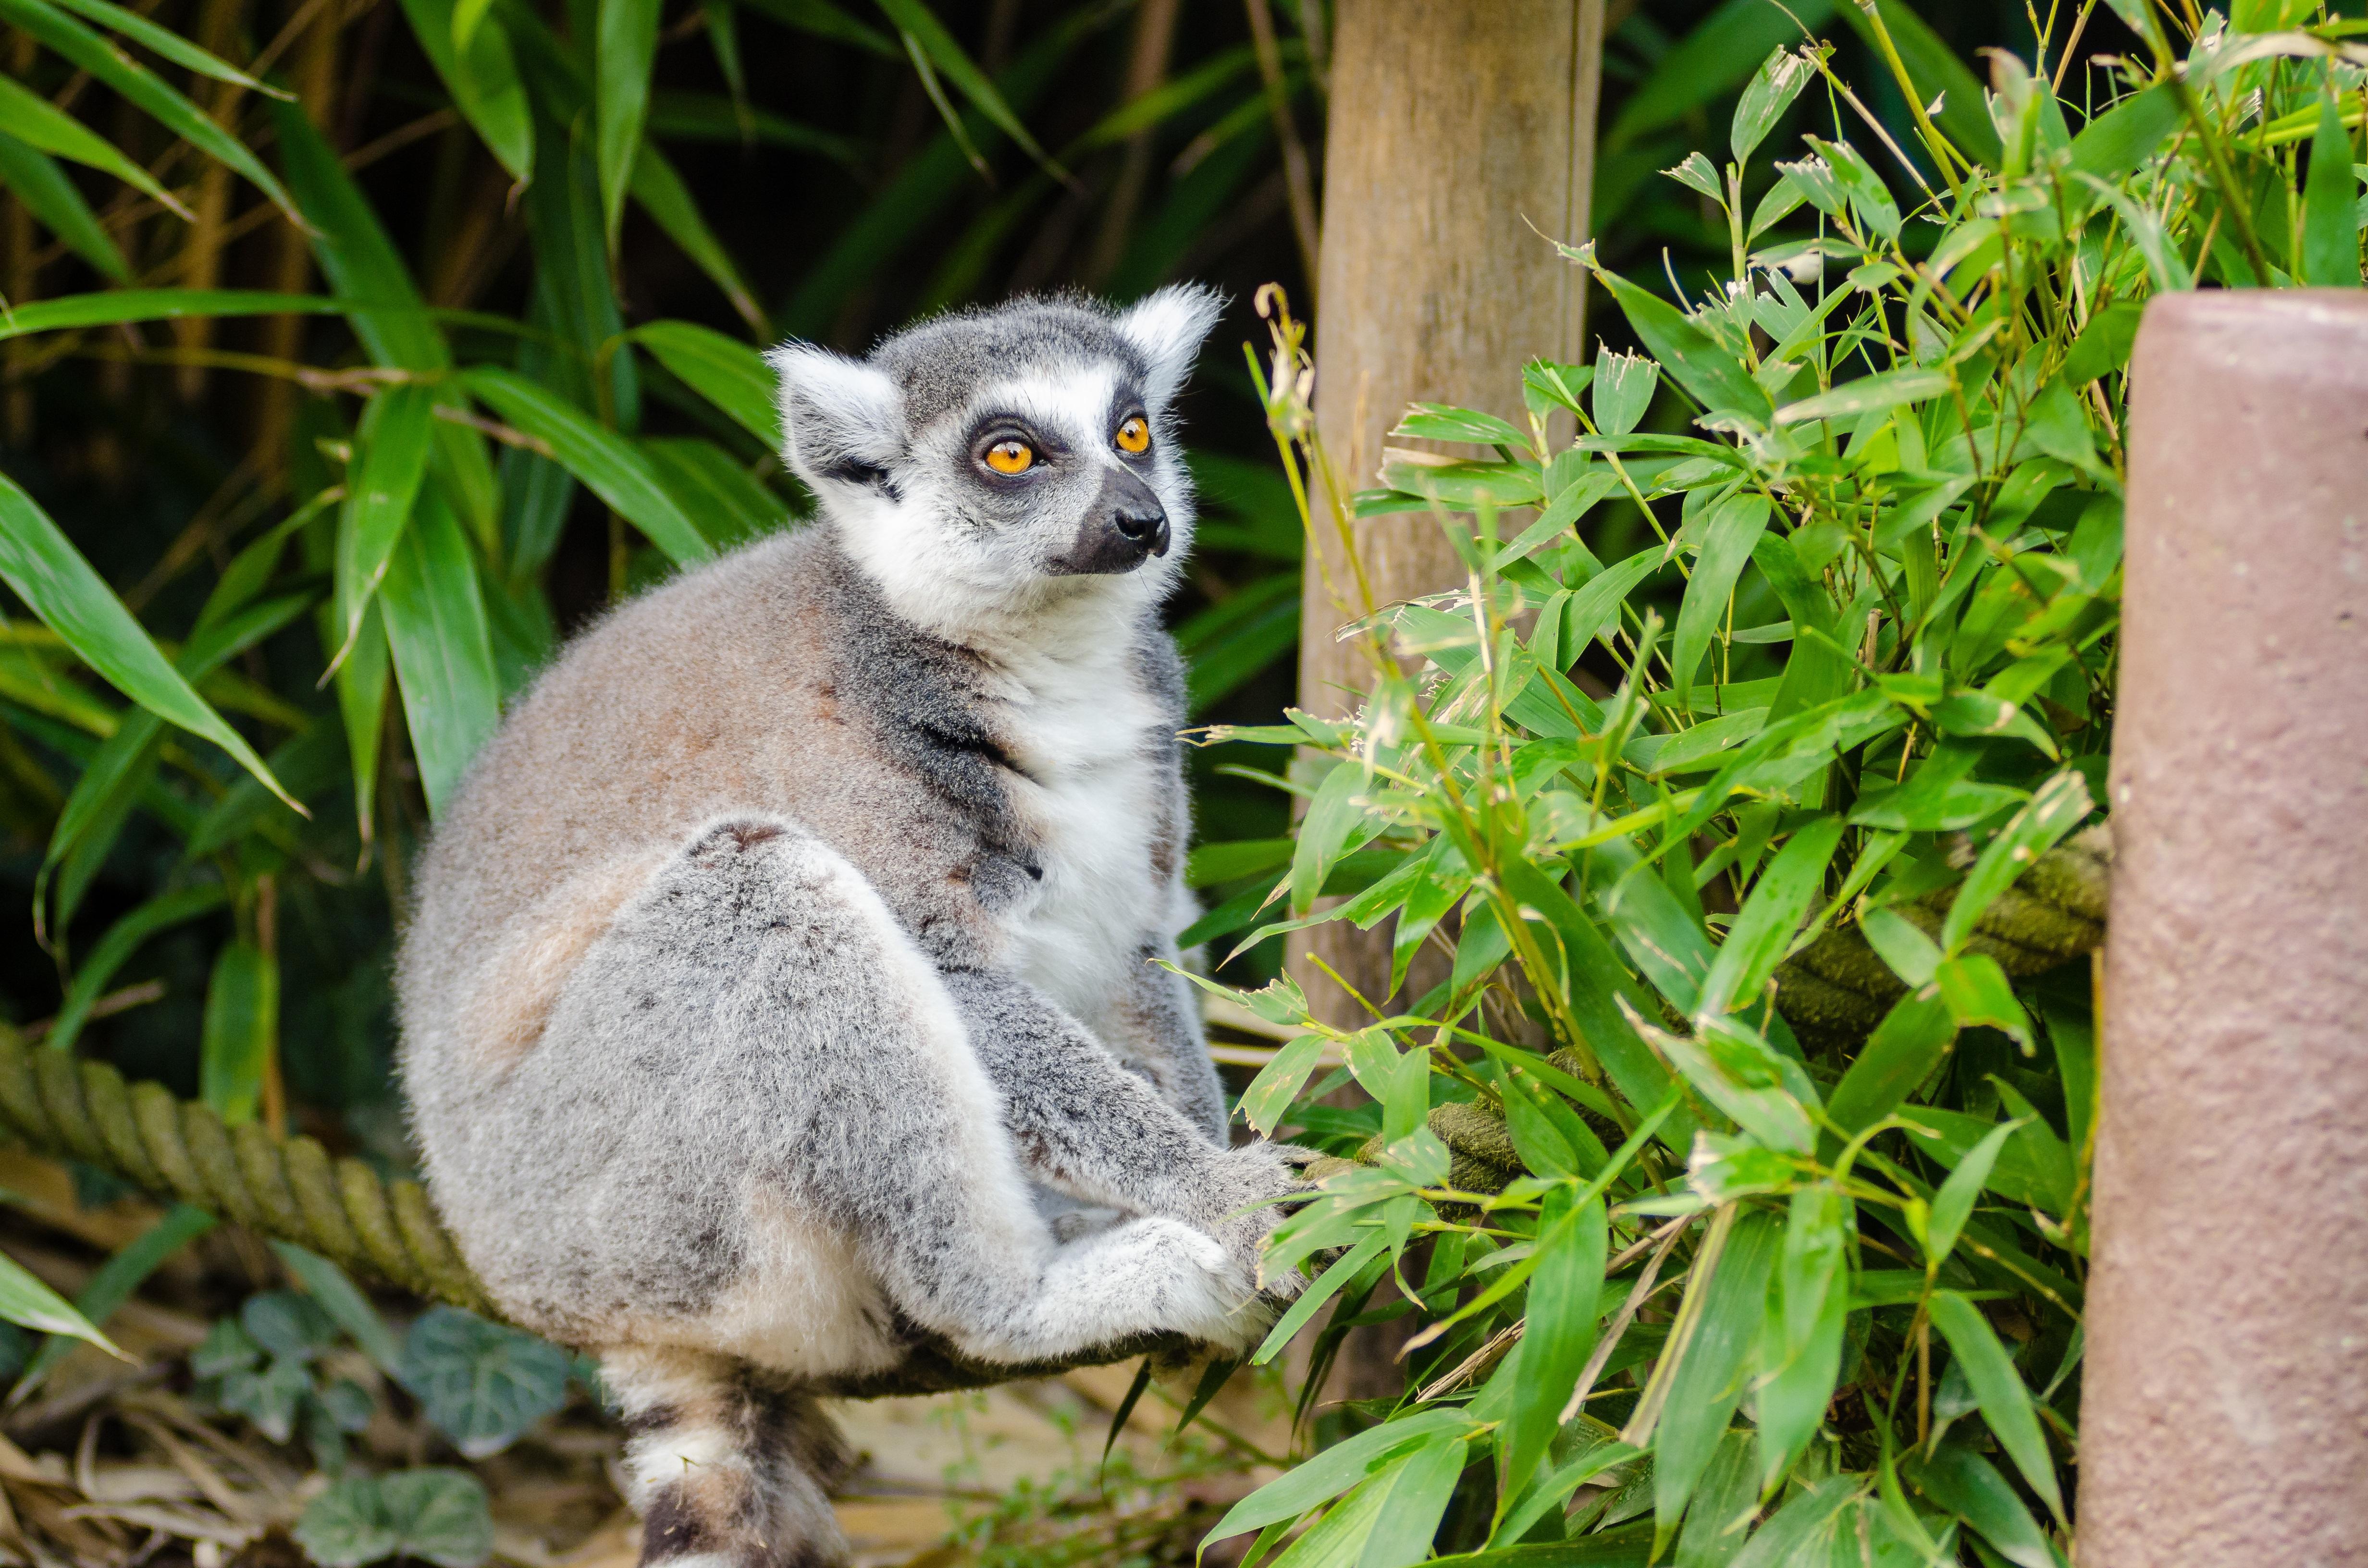 Great Lemur Wallpaper - grass-animal-cute-wildlife-zoo-fur-portrait-mammal-monkey-fauna-primate-madagascar-vertebrate-wallpaper-funny-bamboo-lemur-catta-lemuridae-marsupial-curious-black-grey-white-tail-ringed-626151  Collection_202820.jpg